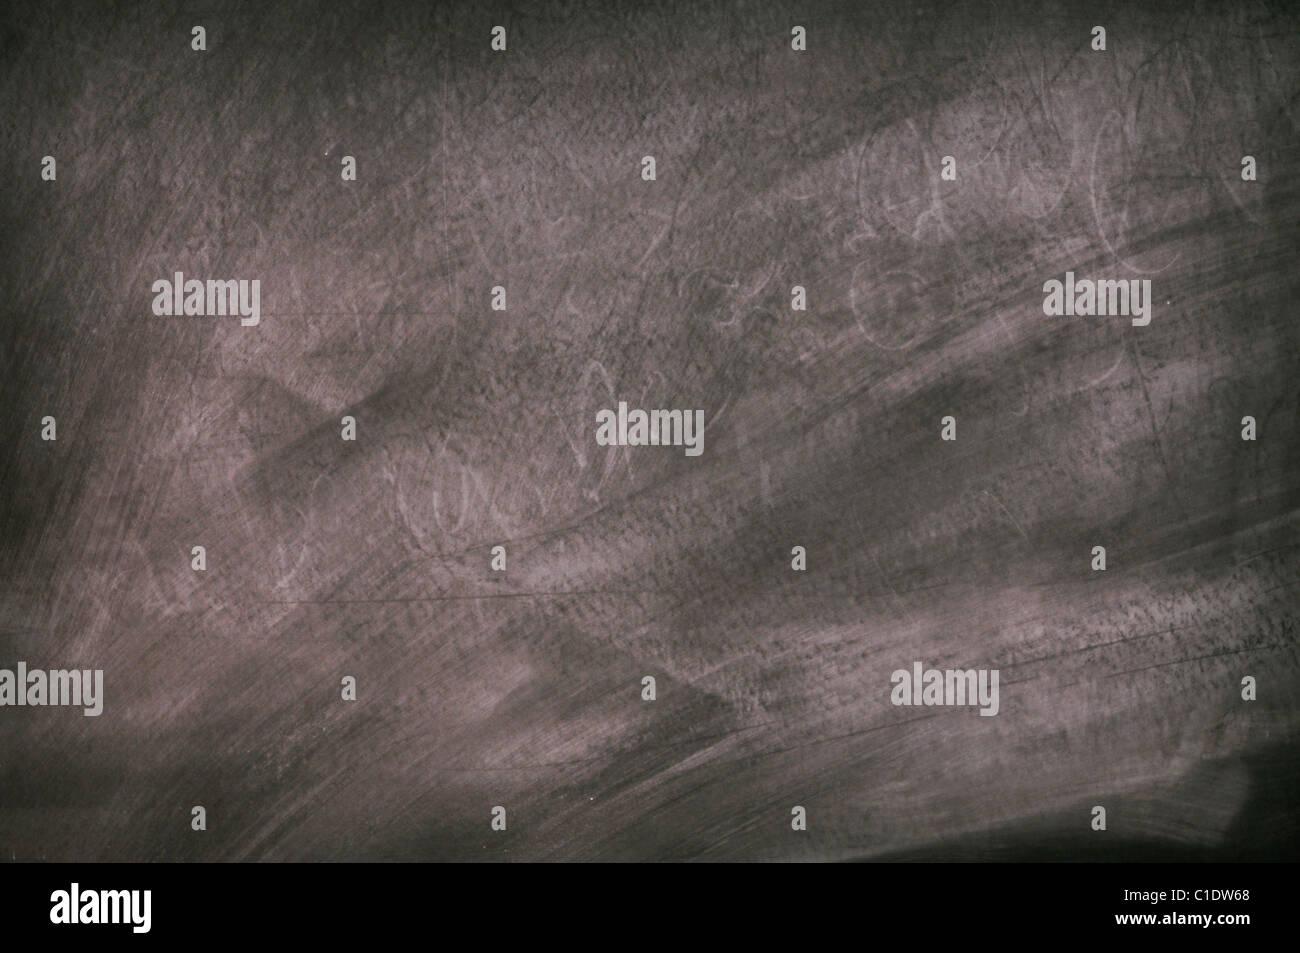 Black slate chalkboard surface - Stock Image